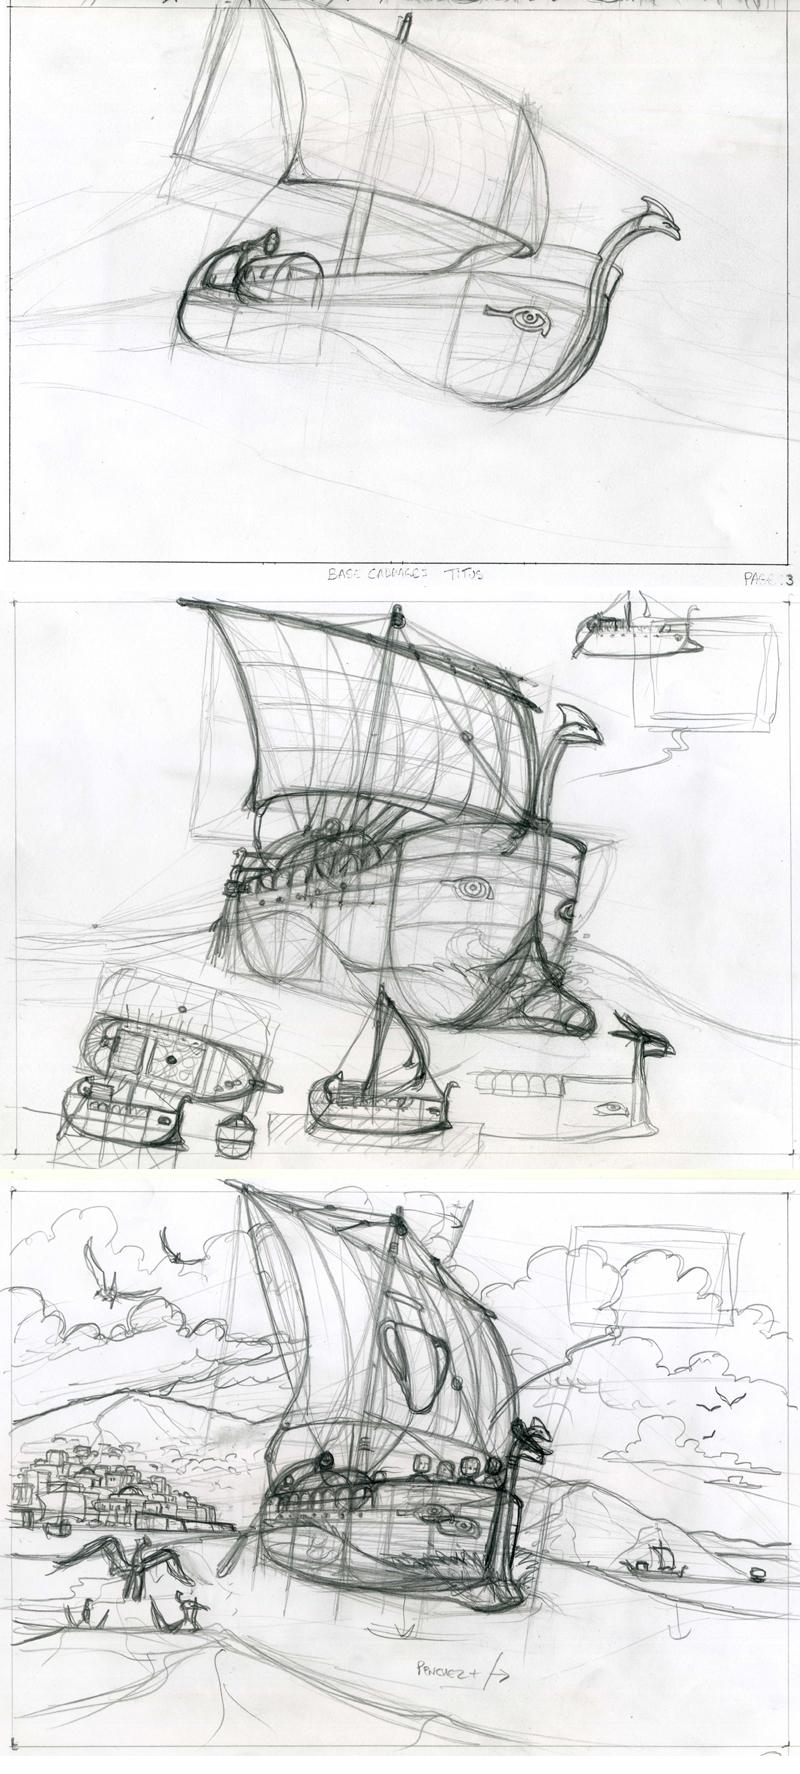 bateau crayon T4 p3 x3